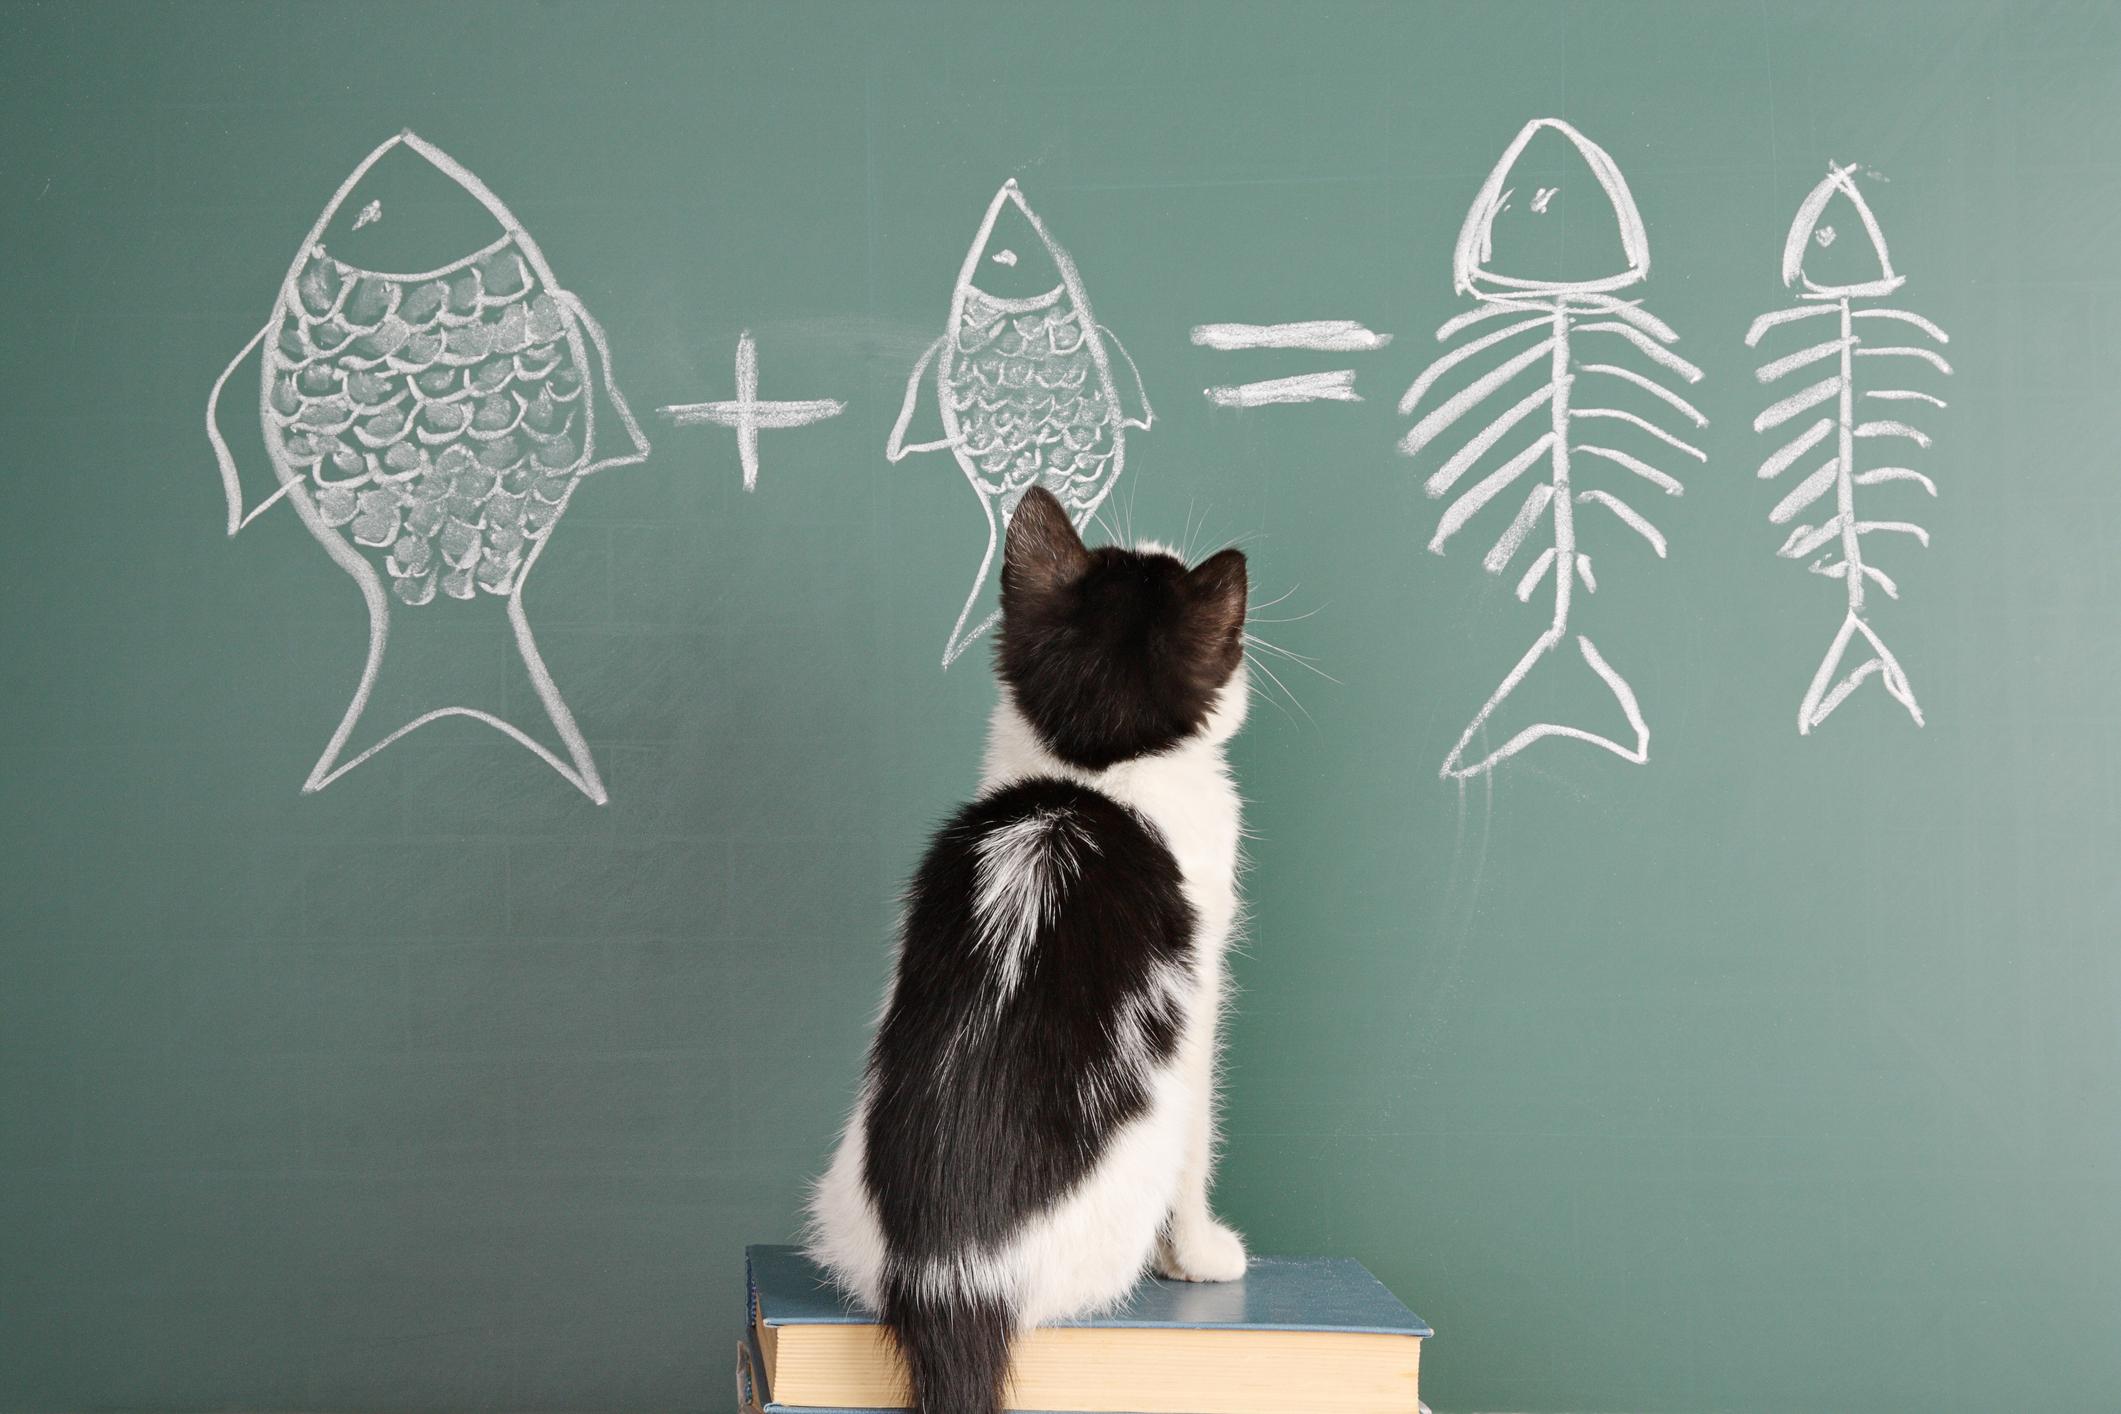 математика картинки животных